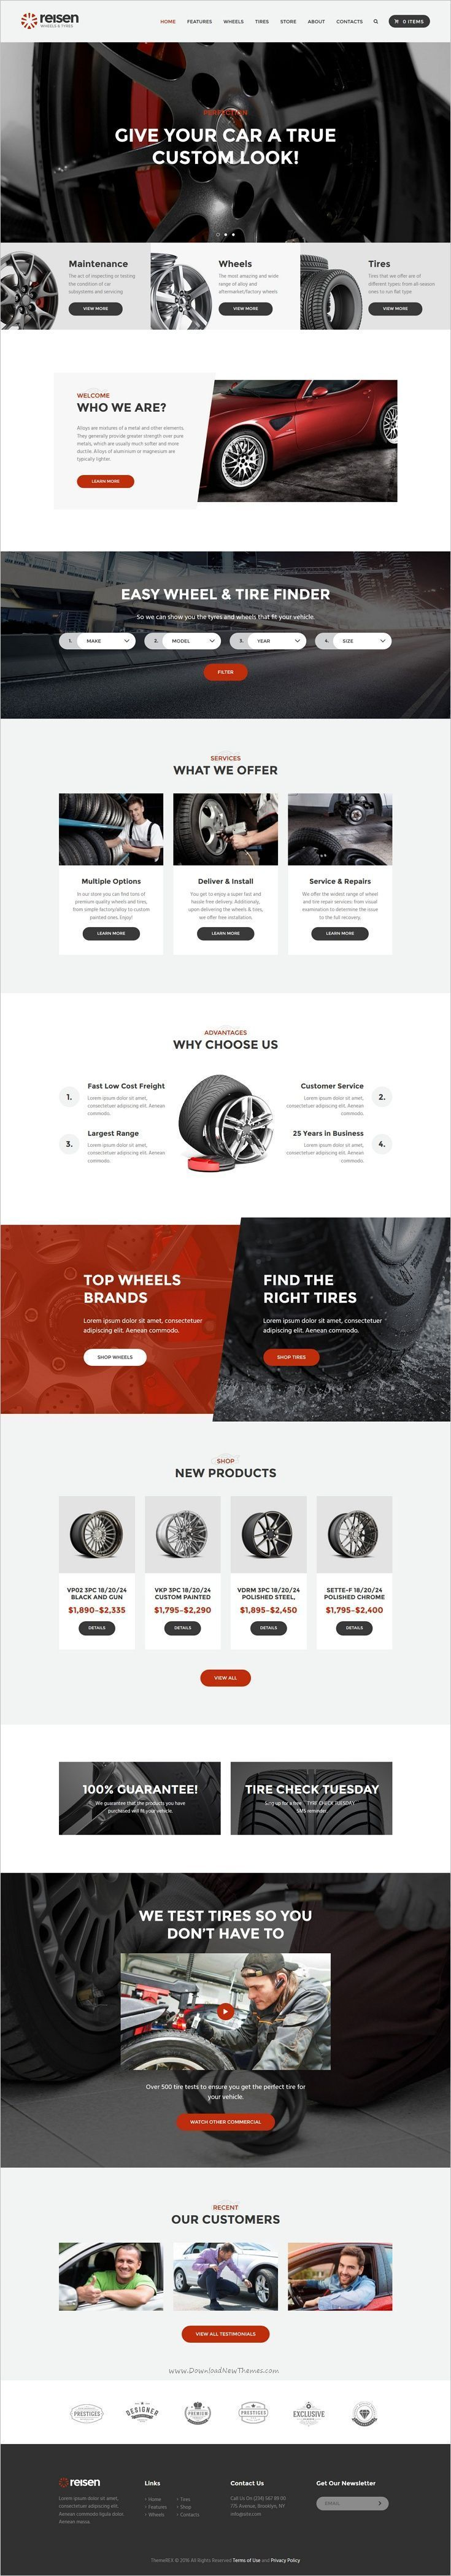 Best 25 car repair shops ideas on pinterest auto repair near me reisen is a unique and modern design responsive wordpress theme for auto mechanics solutioingenieria Image collections